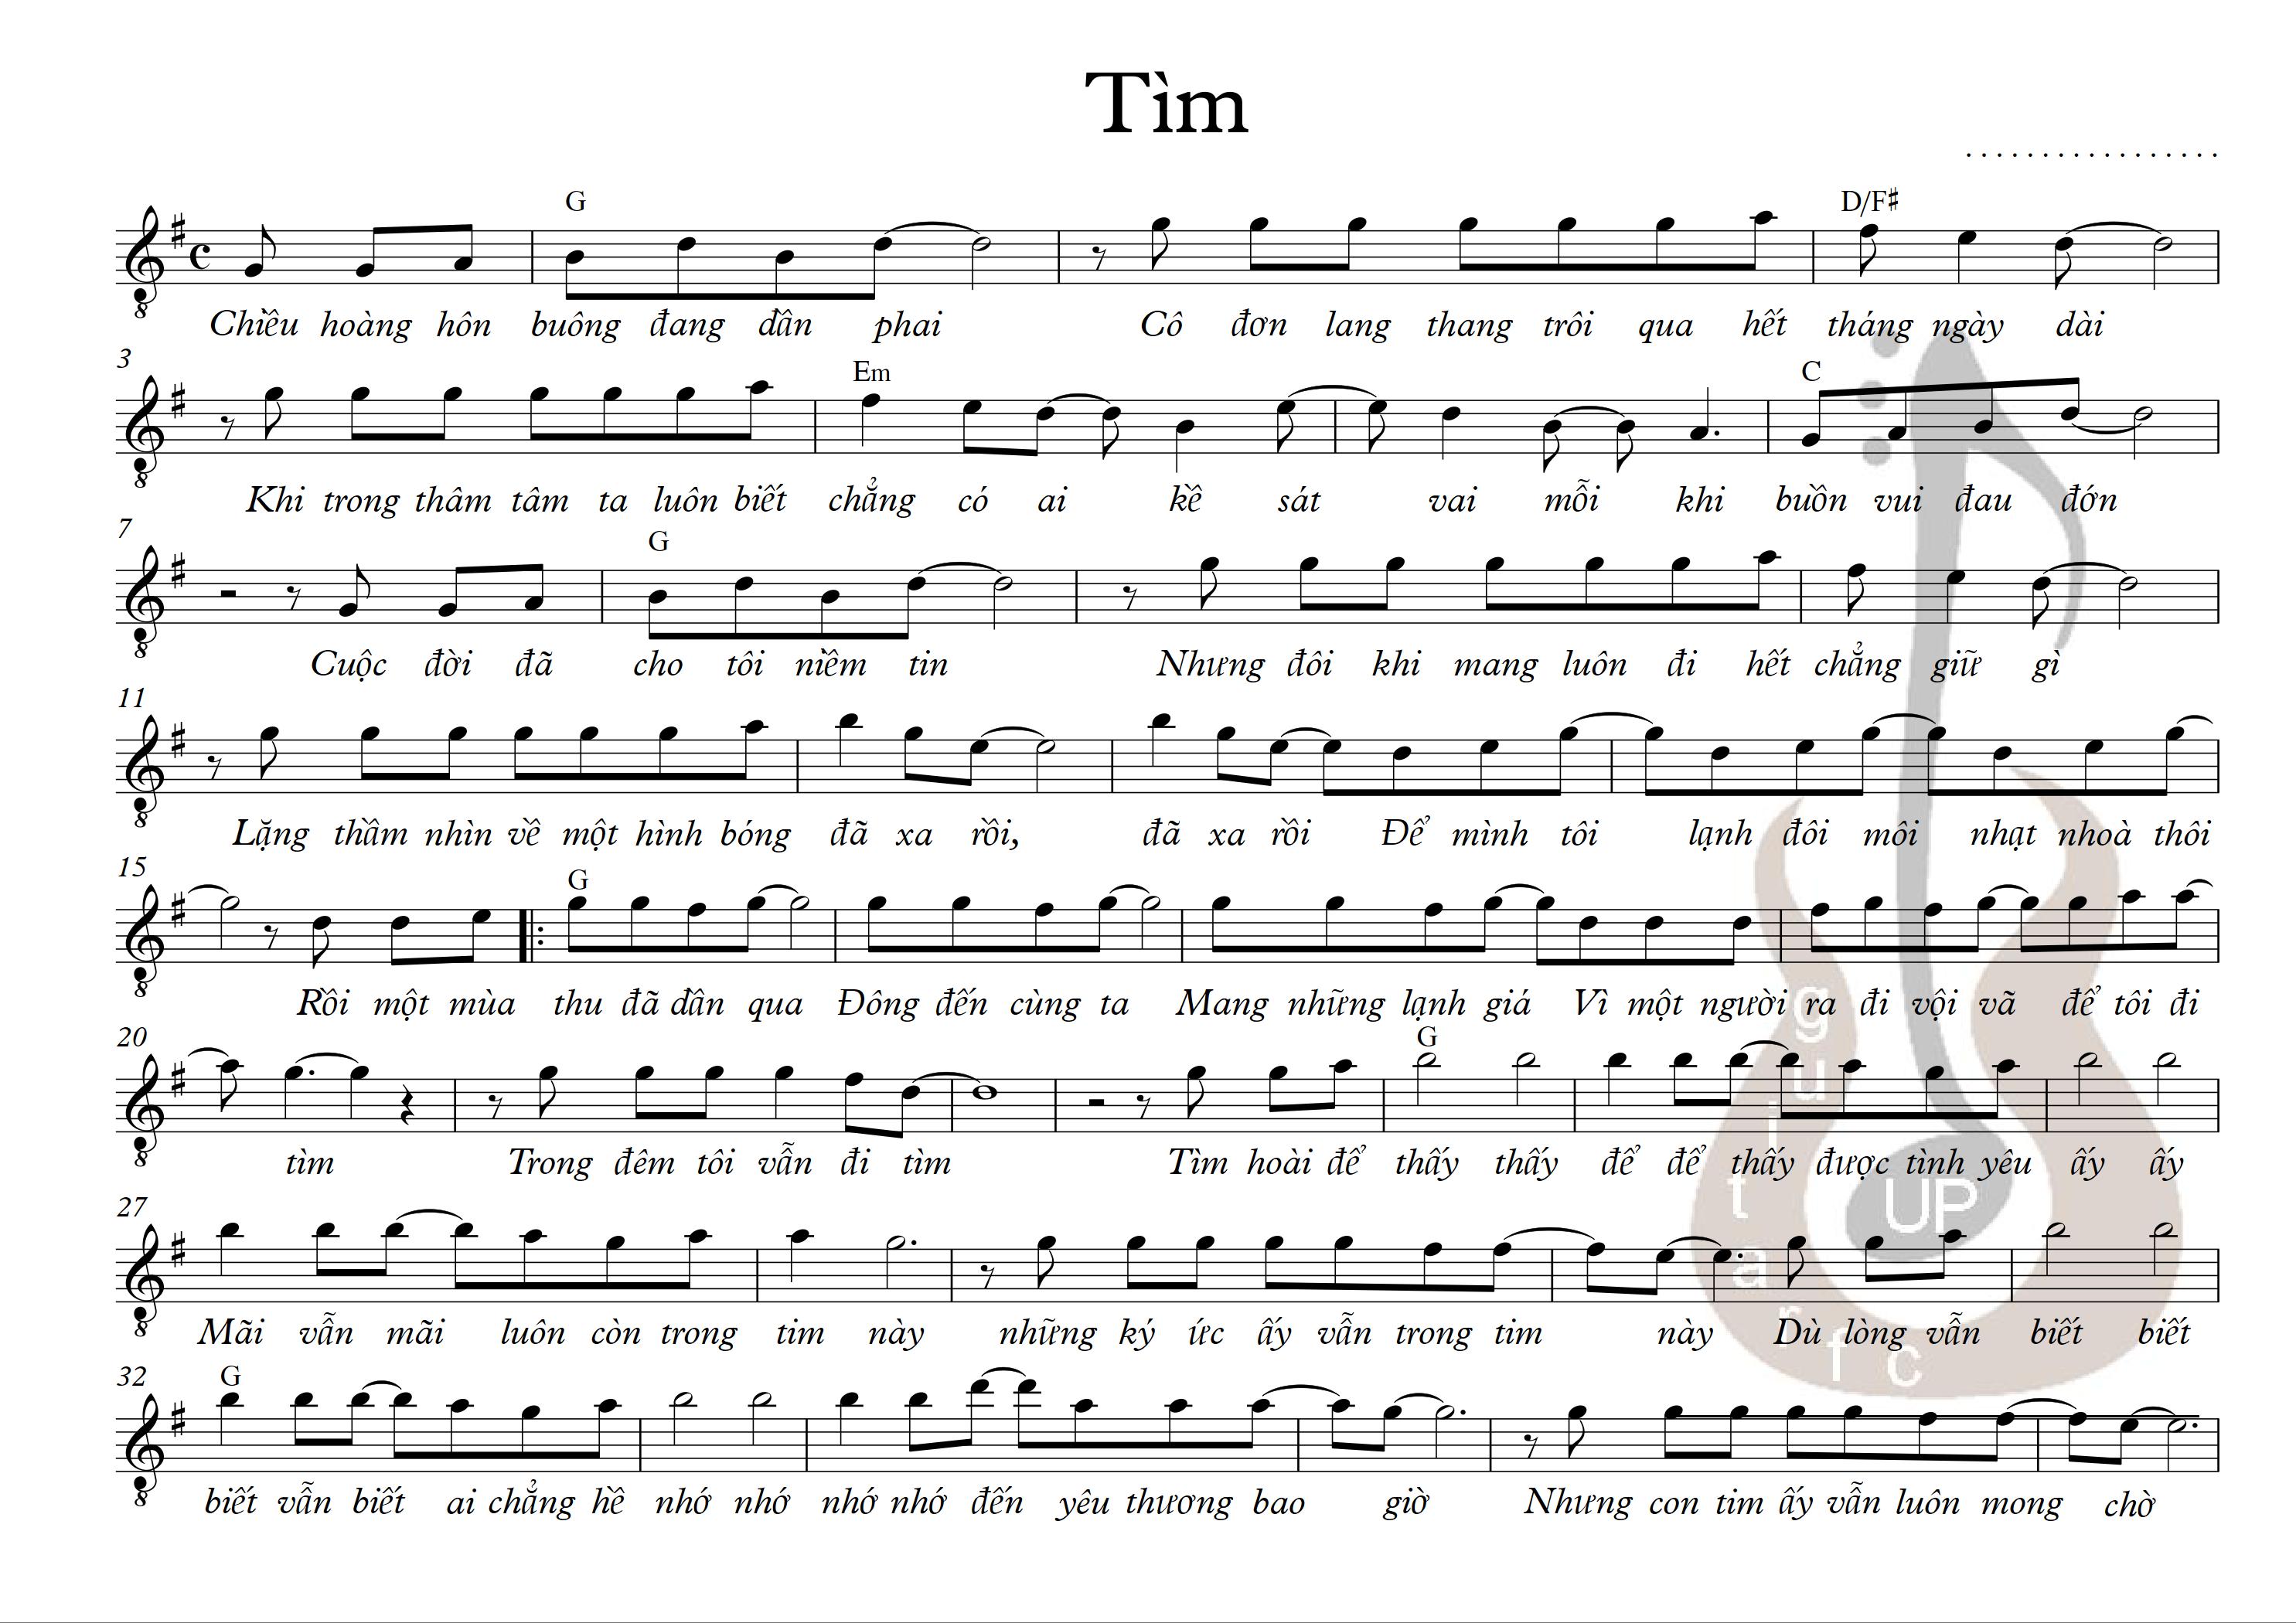 Tim 01